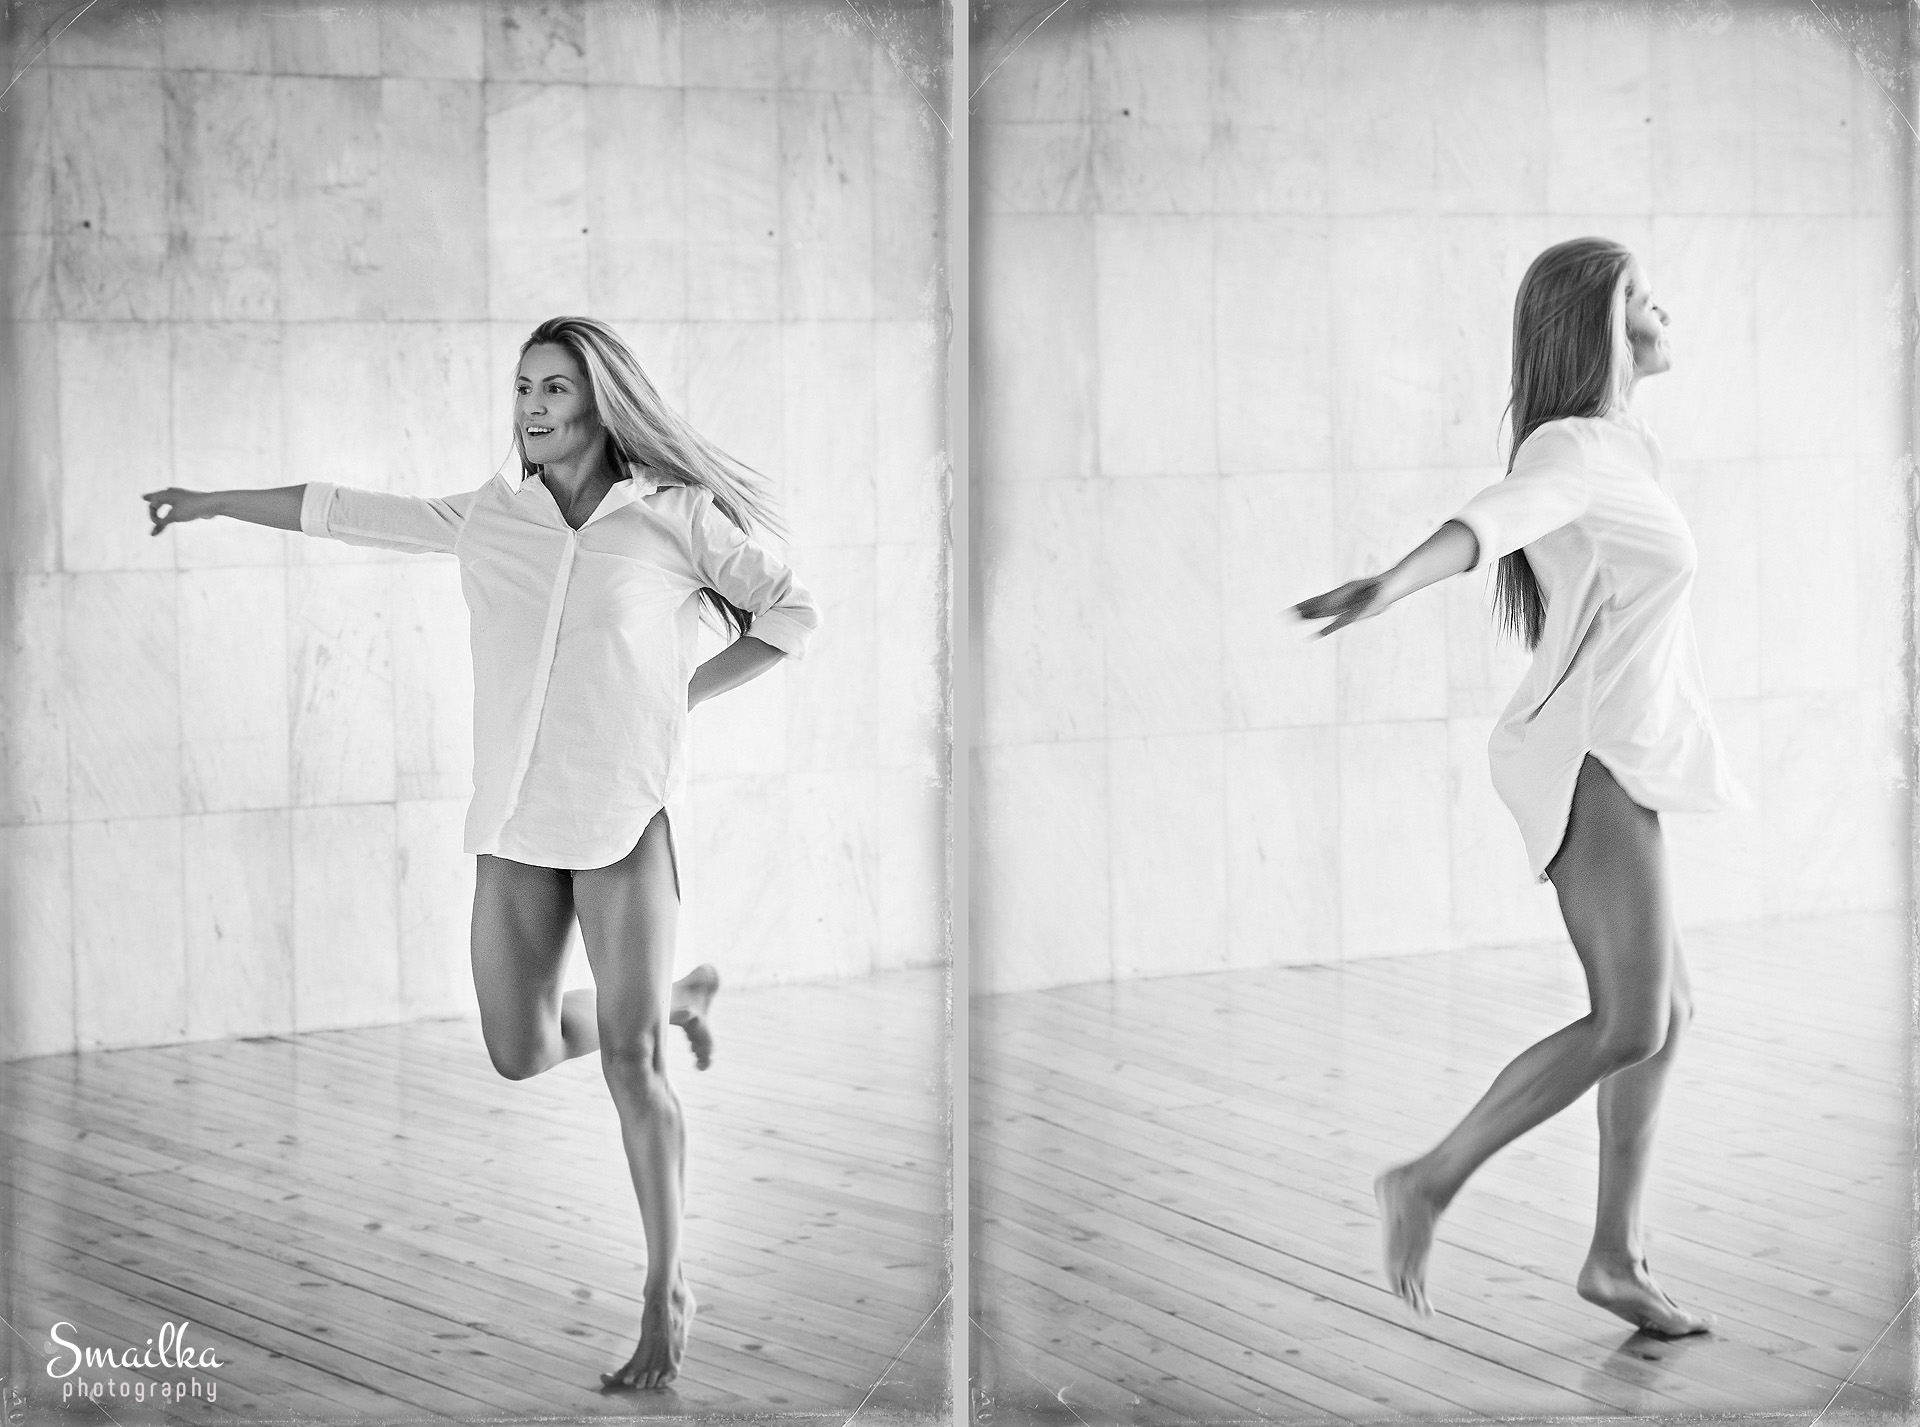 Lifestyle photography Yanica Dobrich dancing